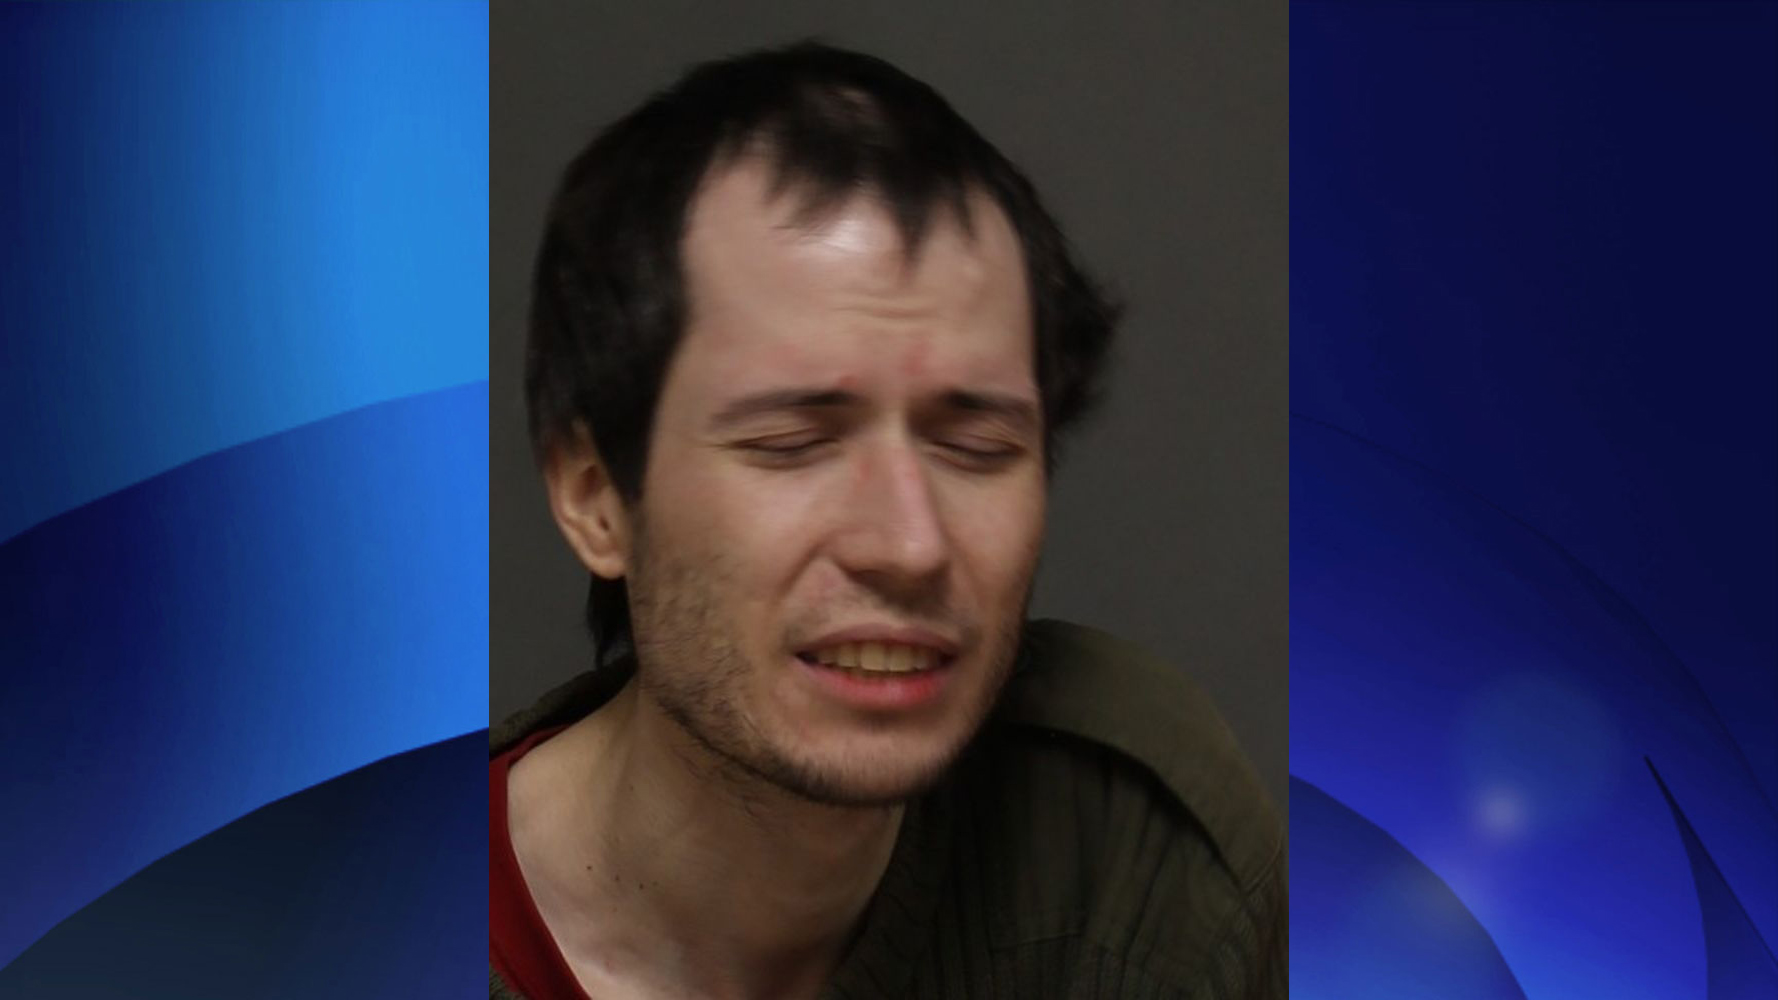 Man escapes custody at Mount Sinai Hospital